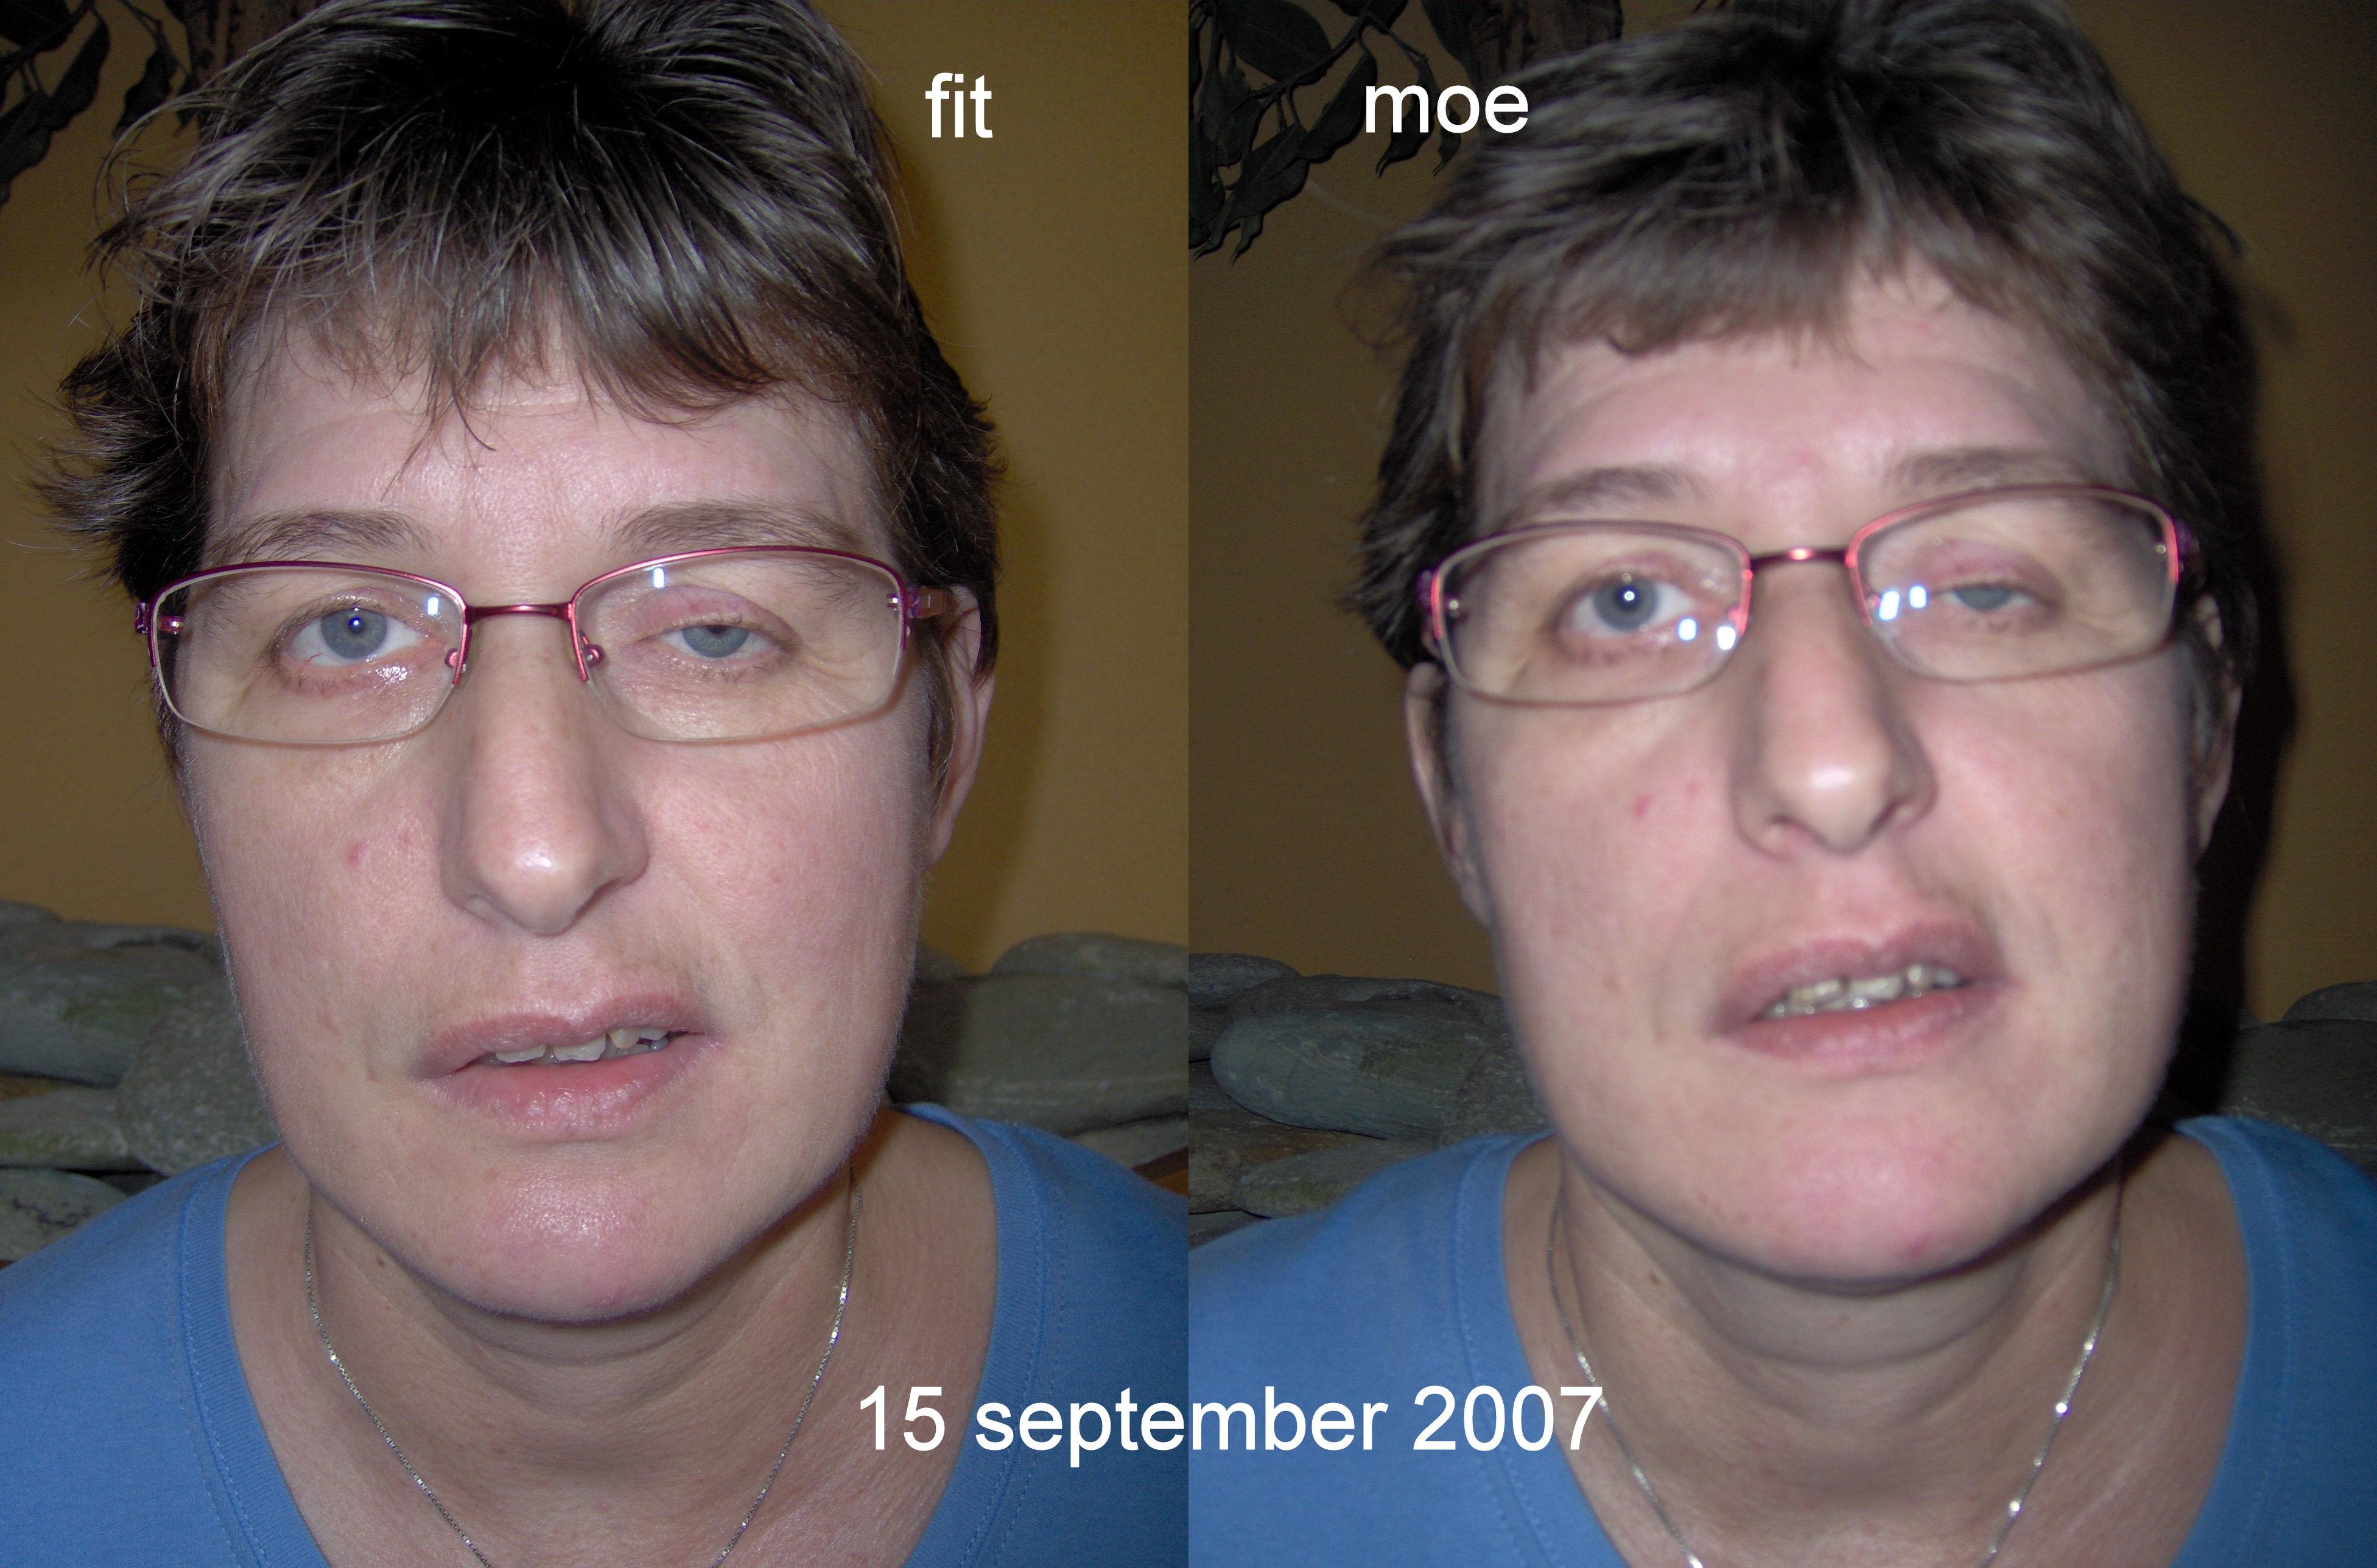 14_15 september 2007 fitmoe